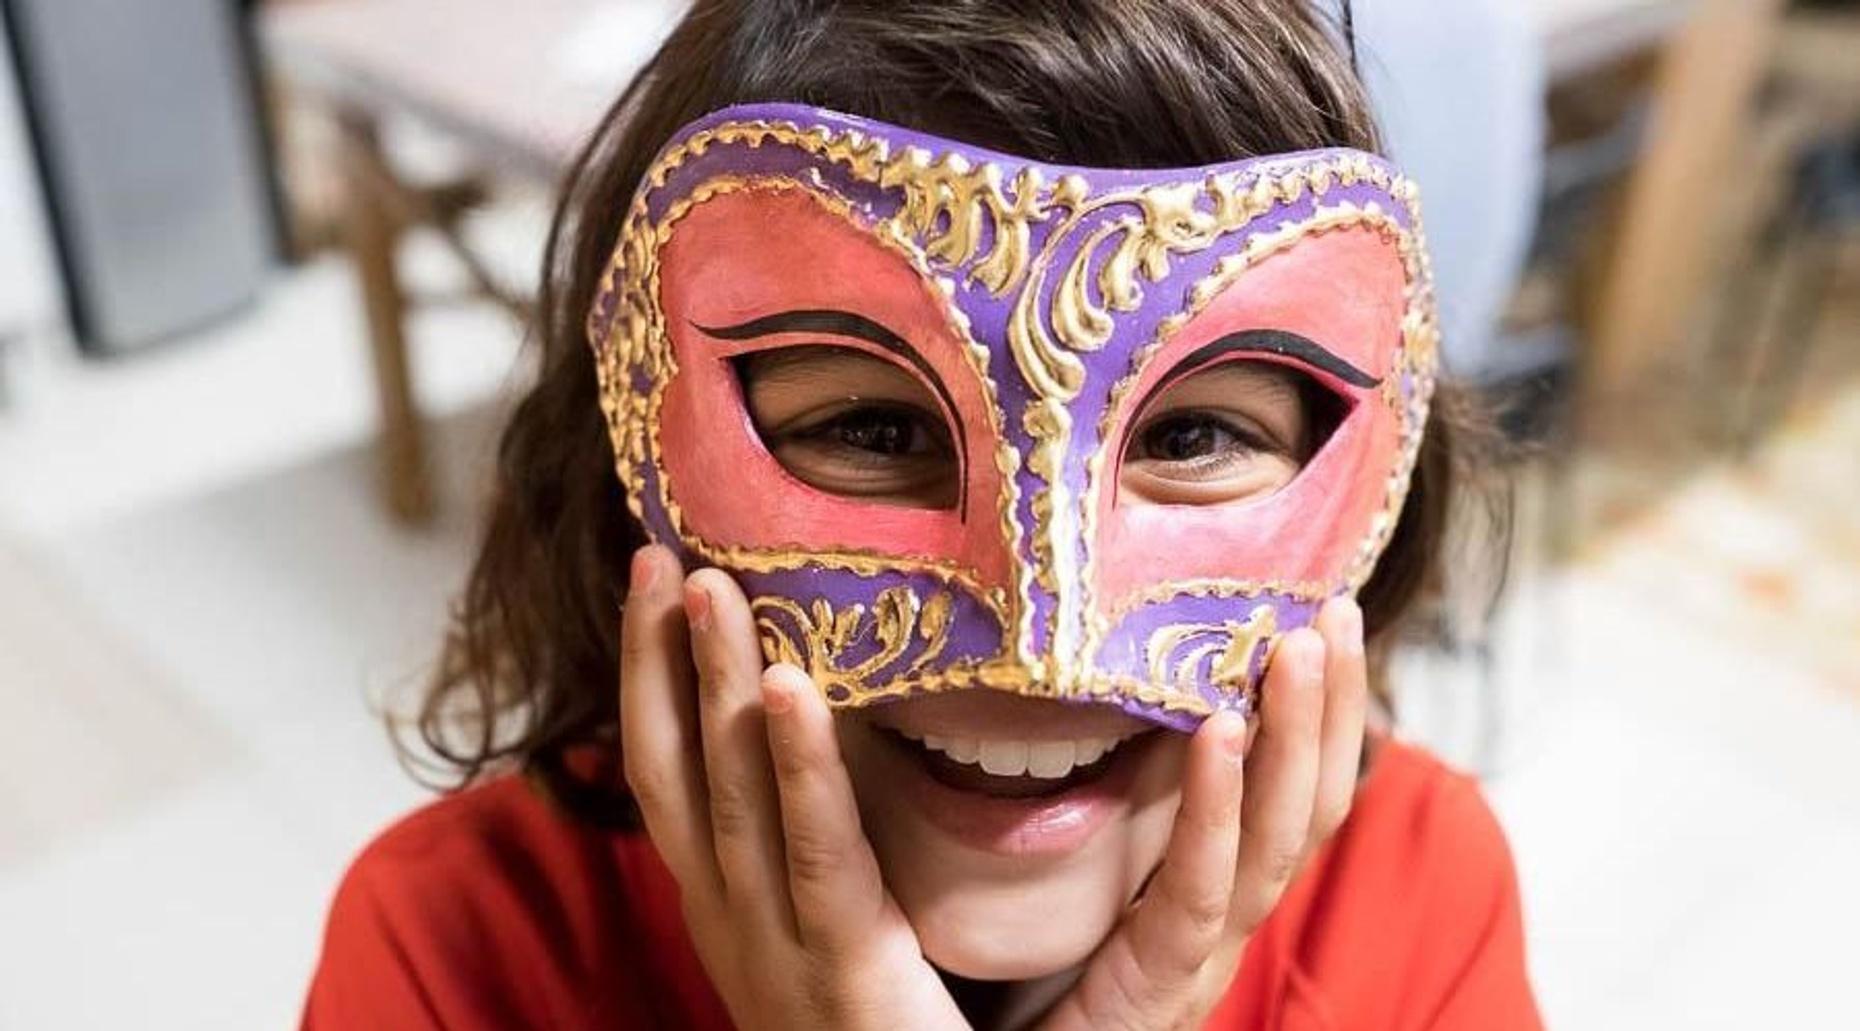 The Venetian Artisans & Mask Lab